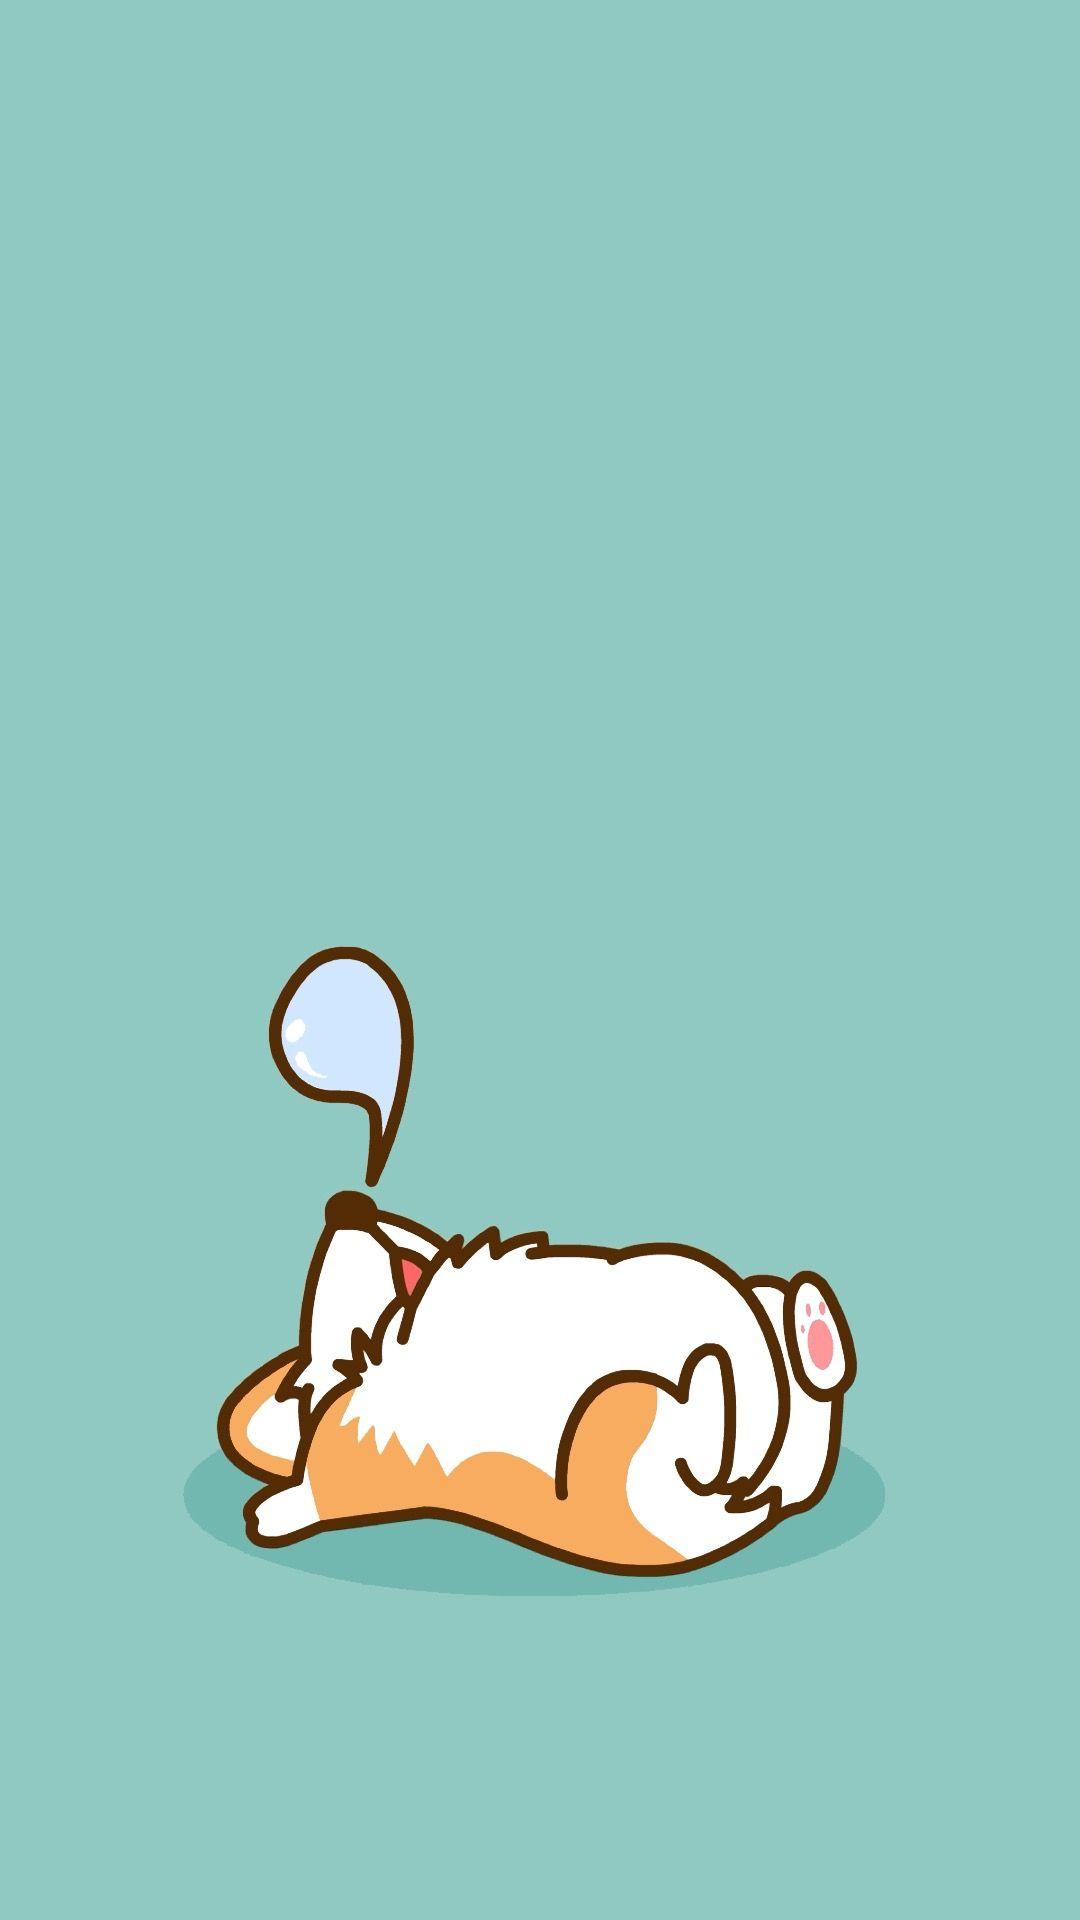 Pin By Pauline Sy On Wallpapers Dog Wallpaper Iphone Corgi Wallpaper Cute Cartoon Wallpapers